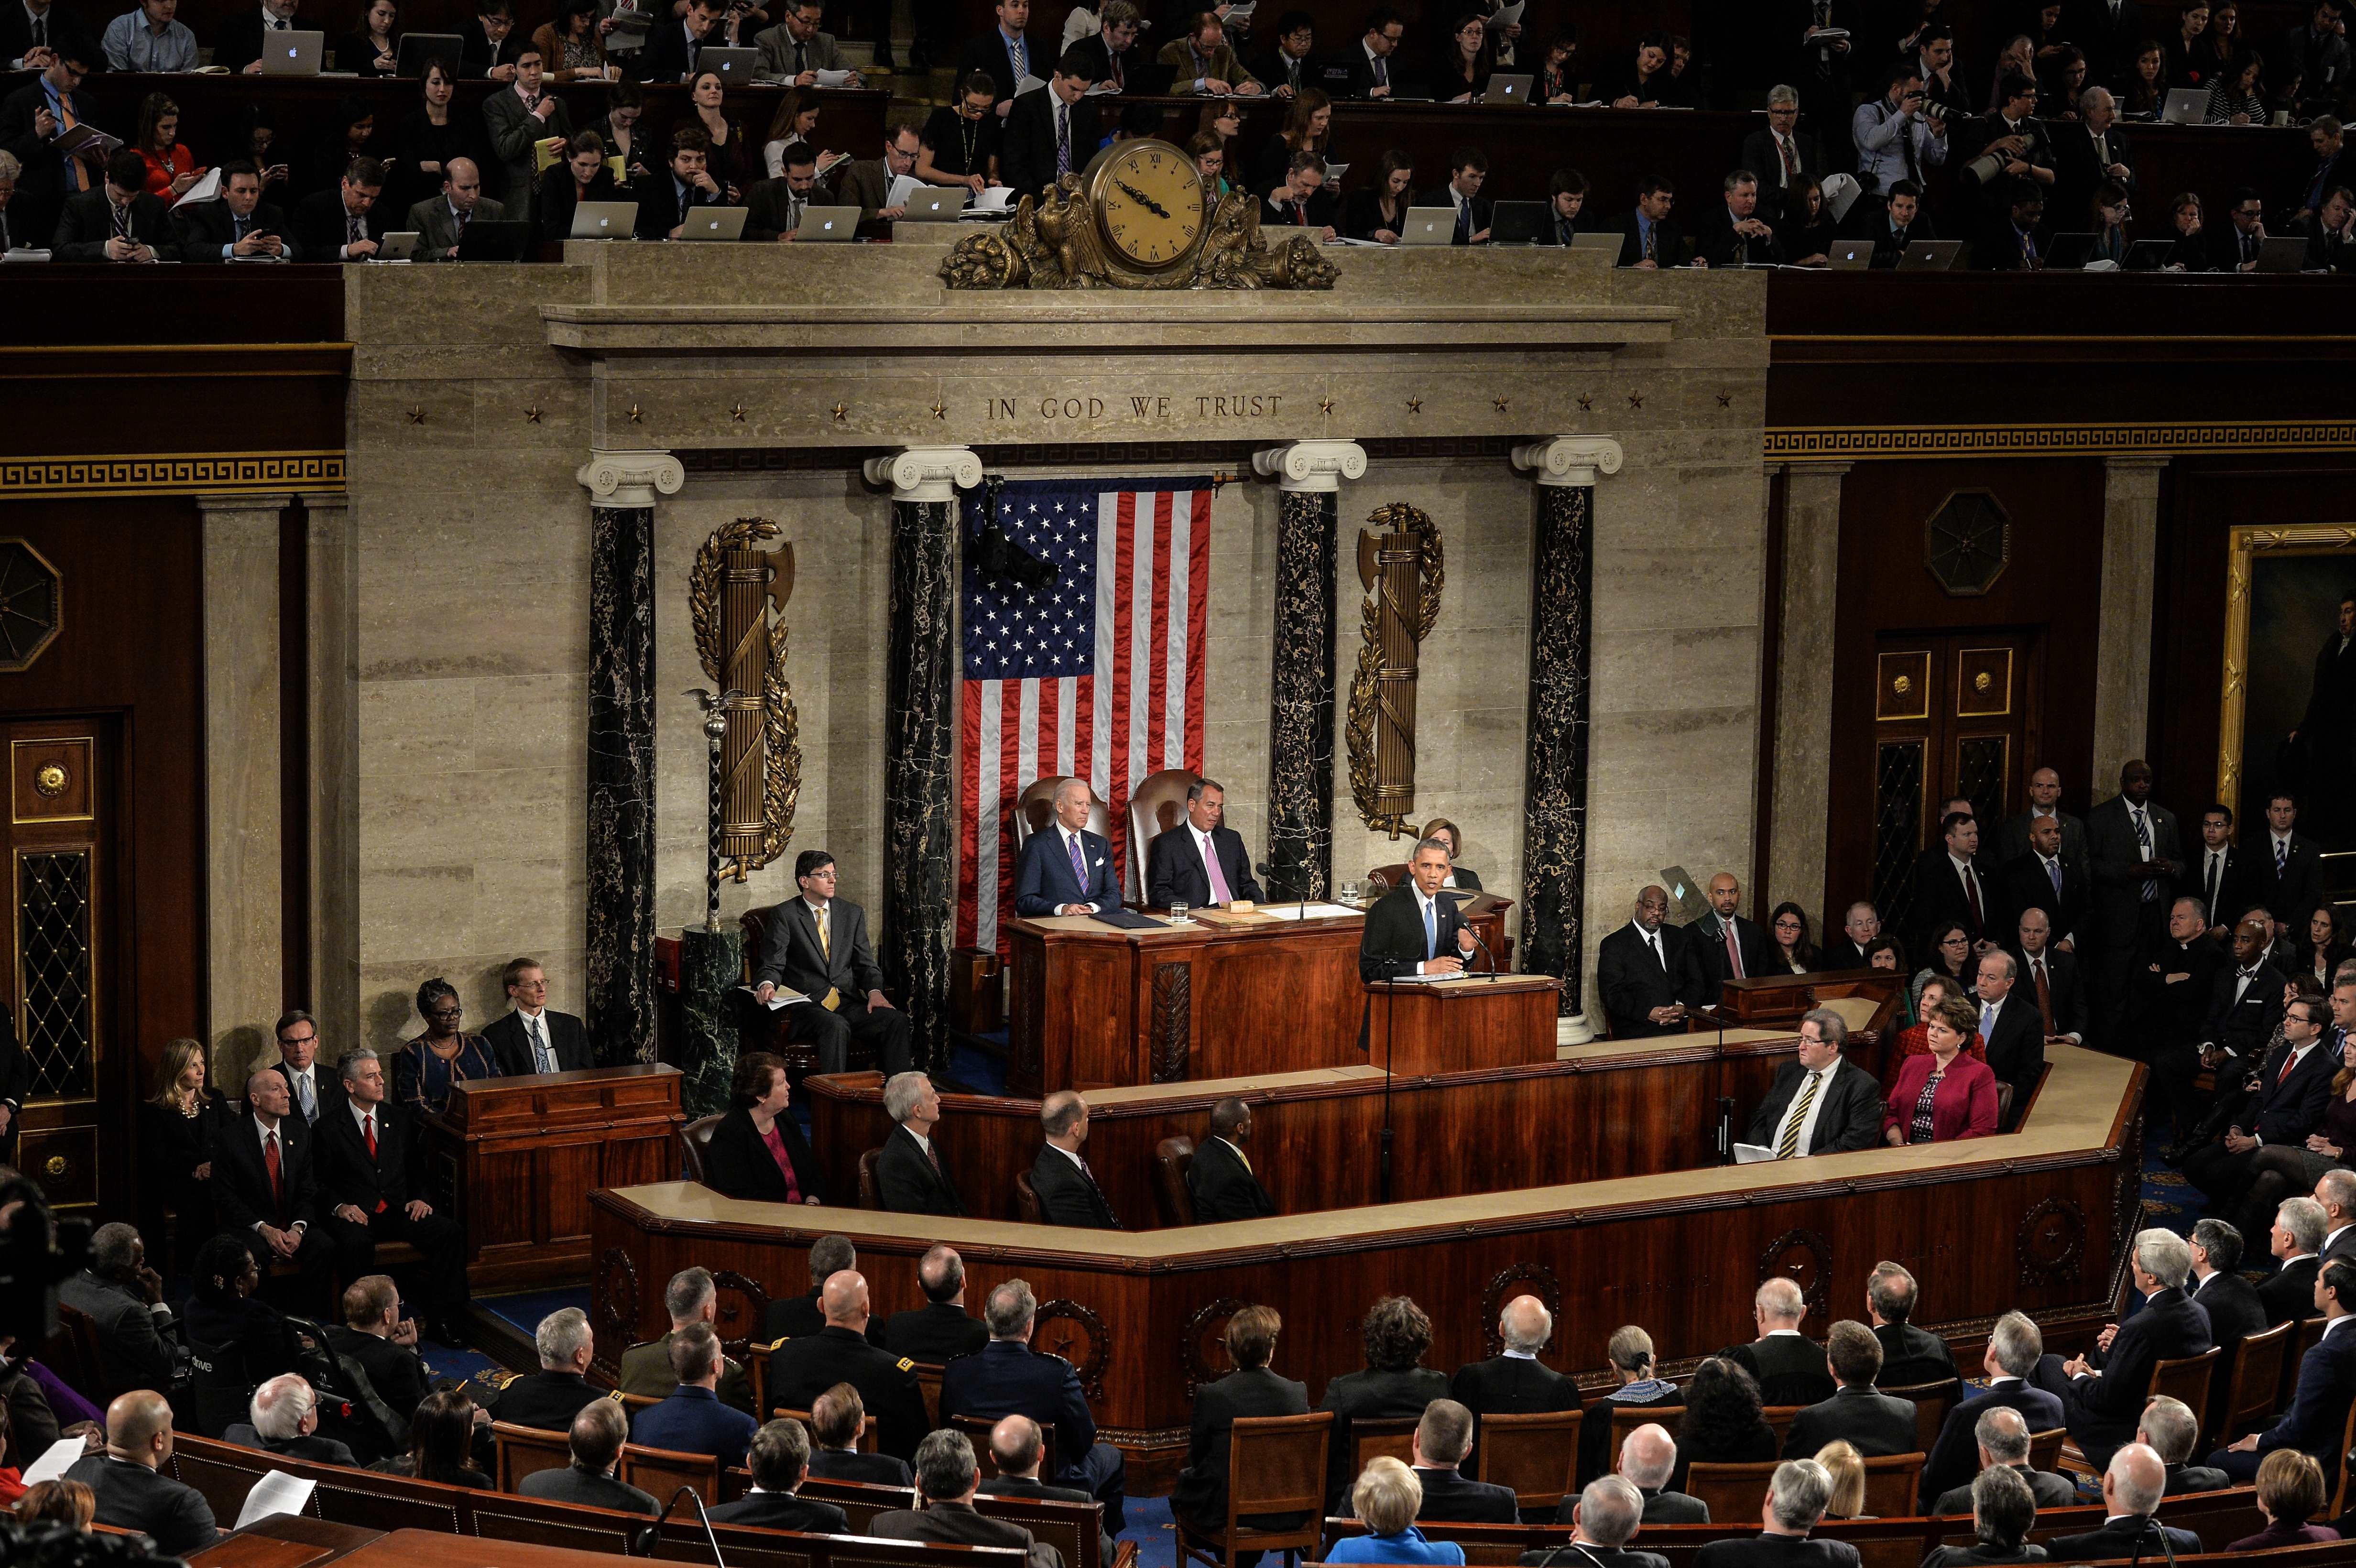 US-POLITICS-STATE OF THE UNION-OBAMA